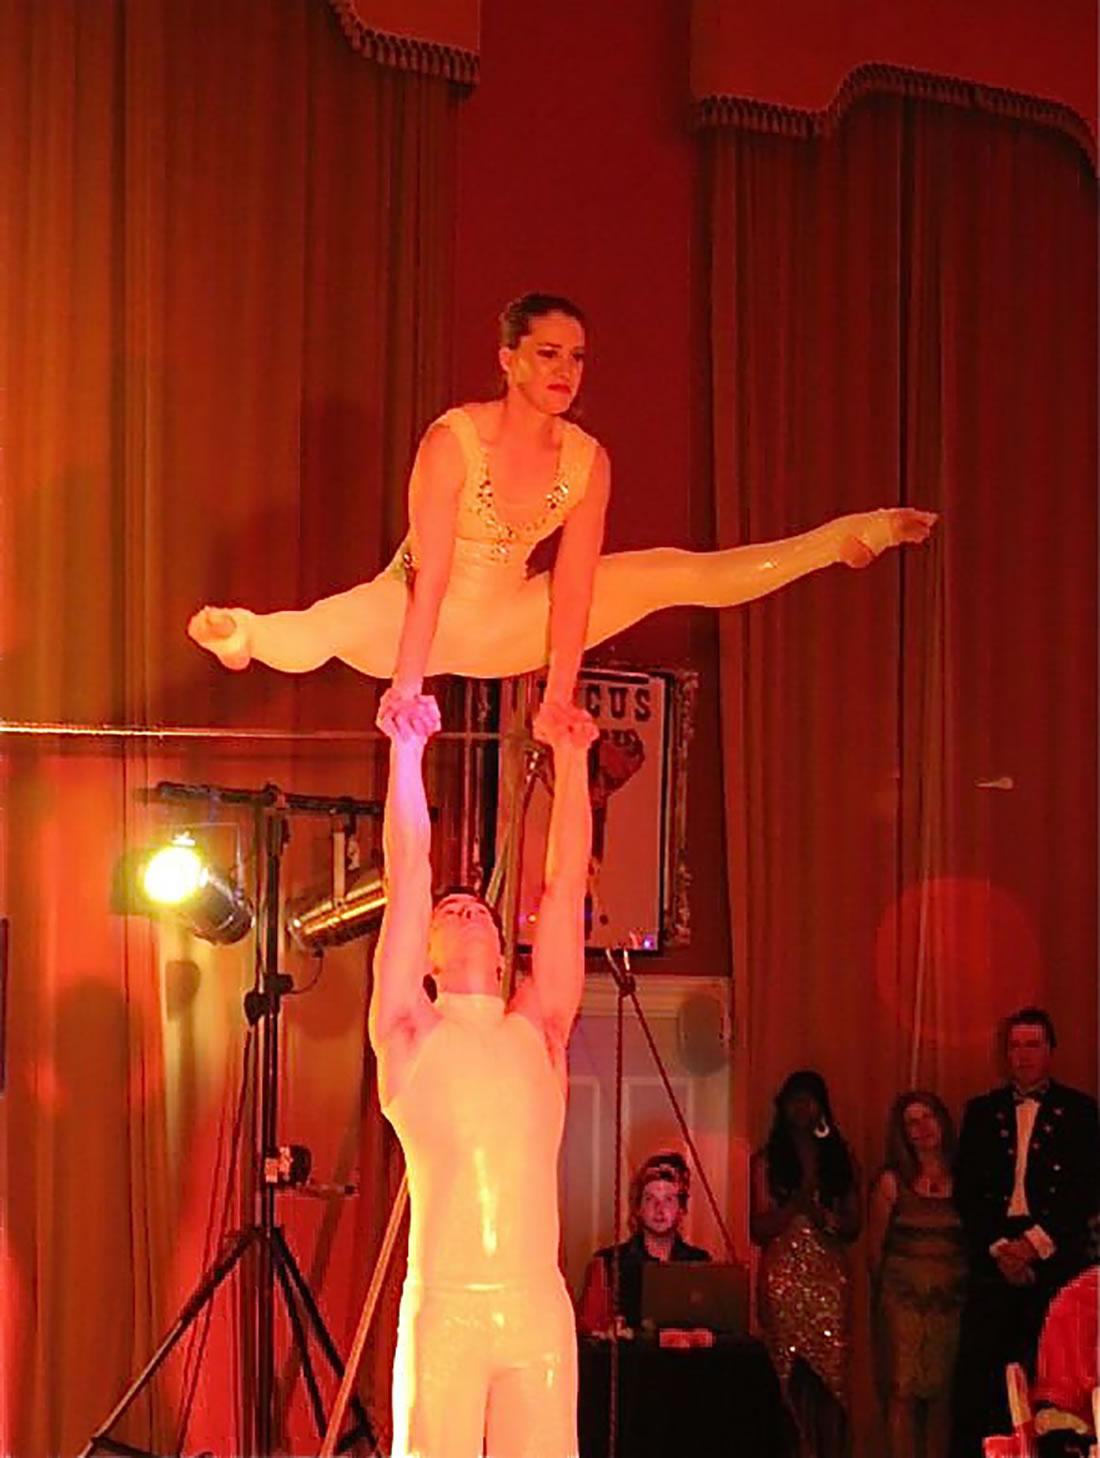 Groundbased Shows - Acrobats Gallery - Revolving podium 4